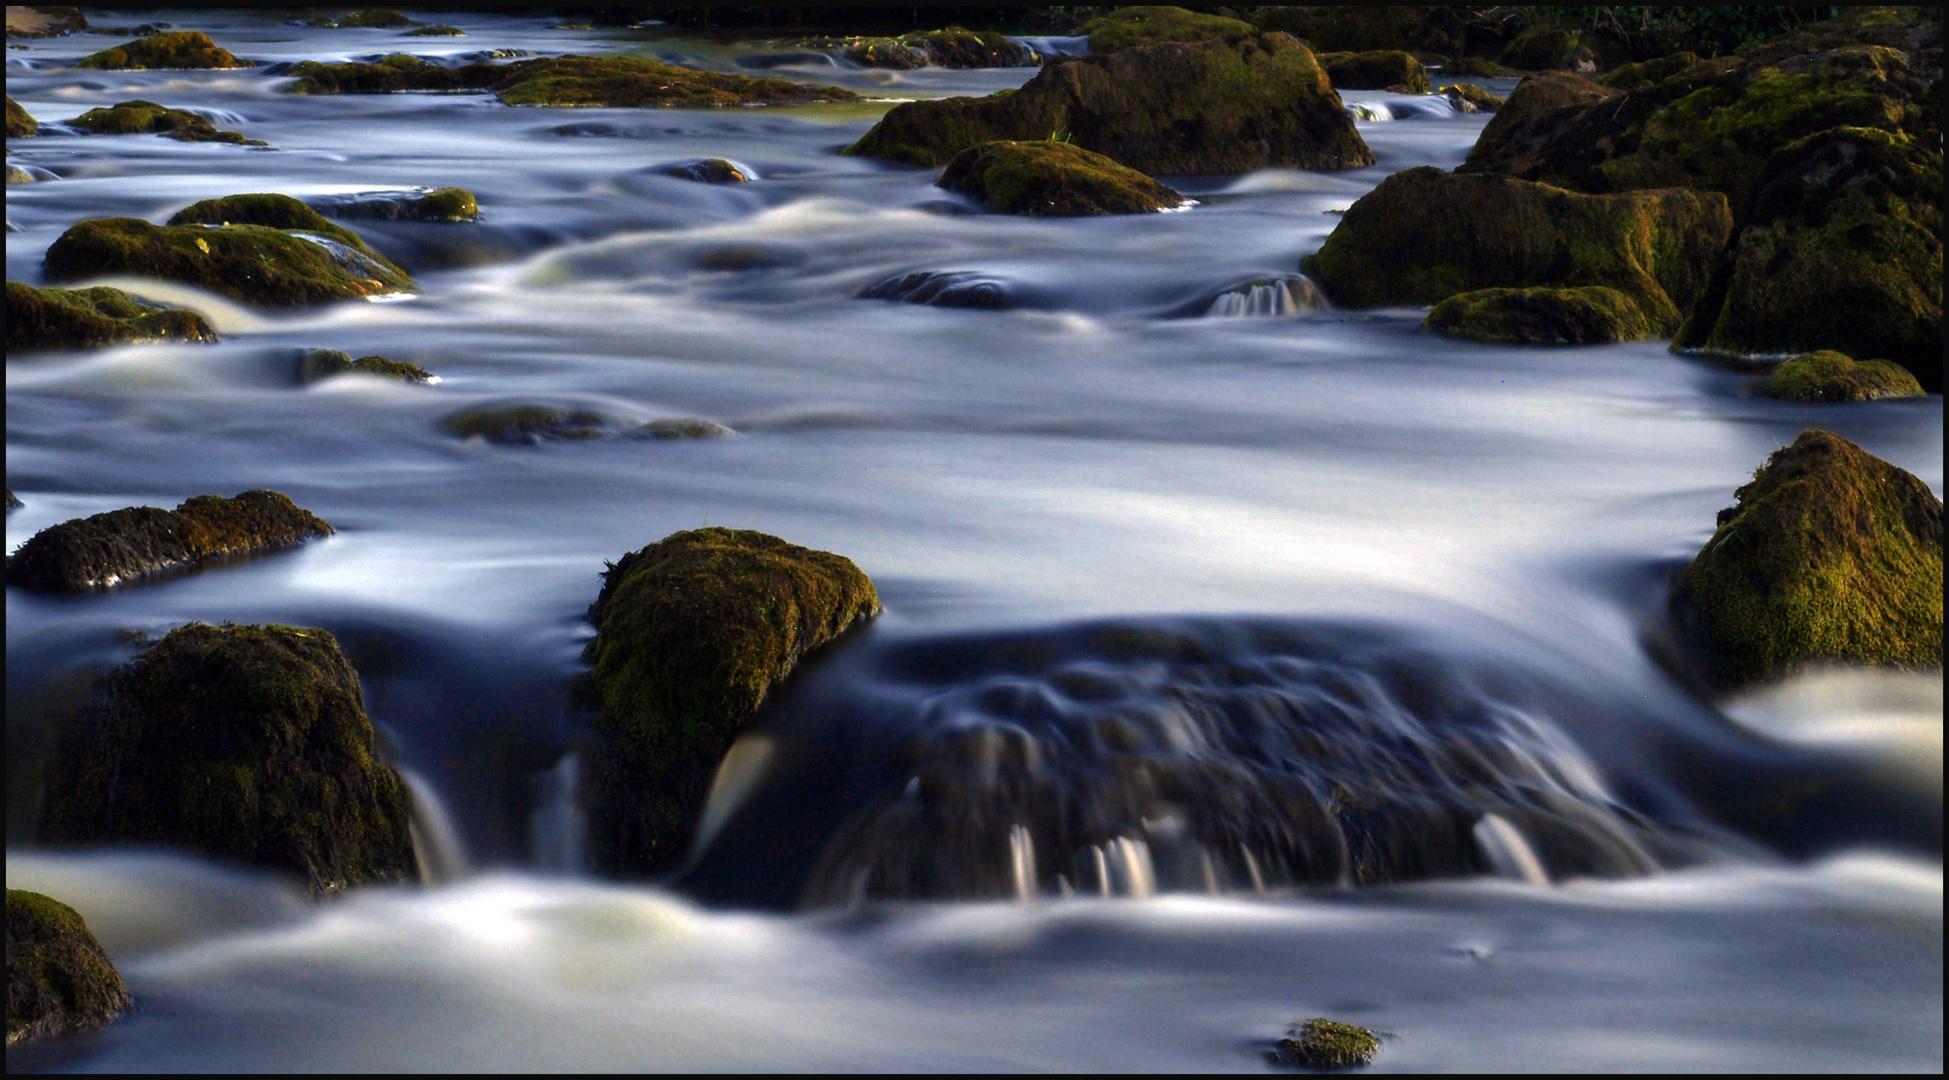 Caragh River